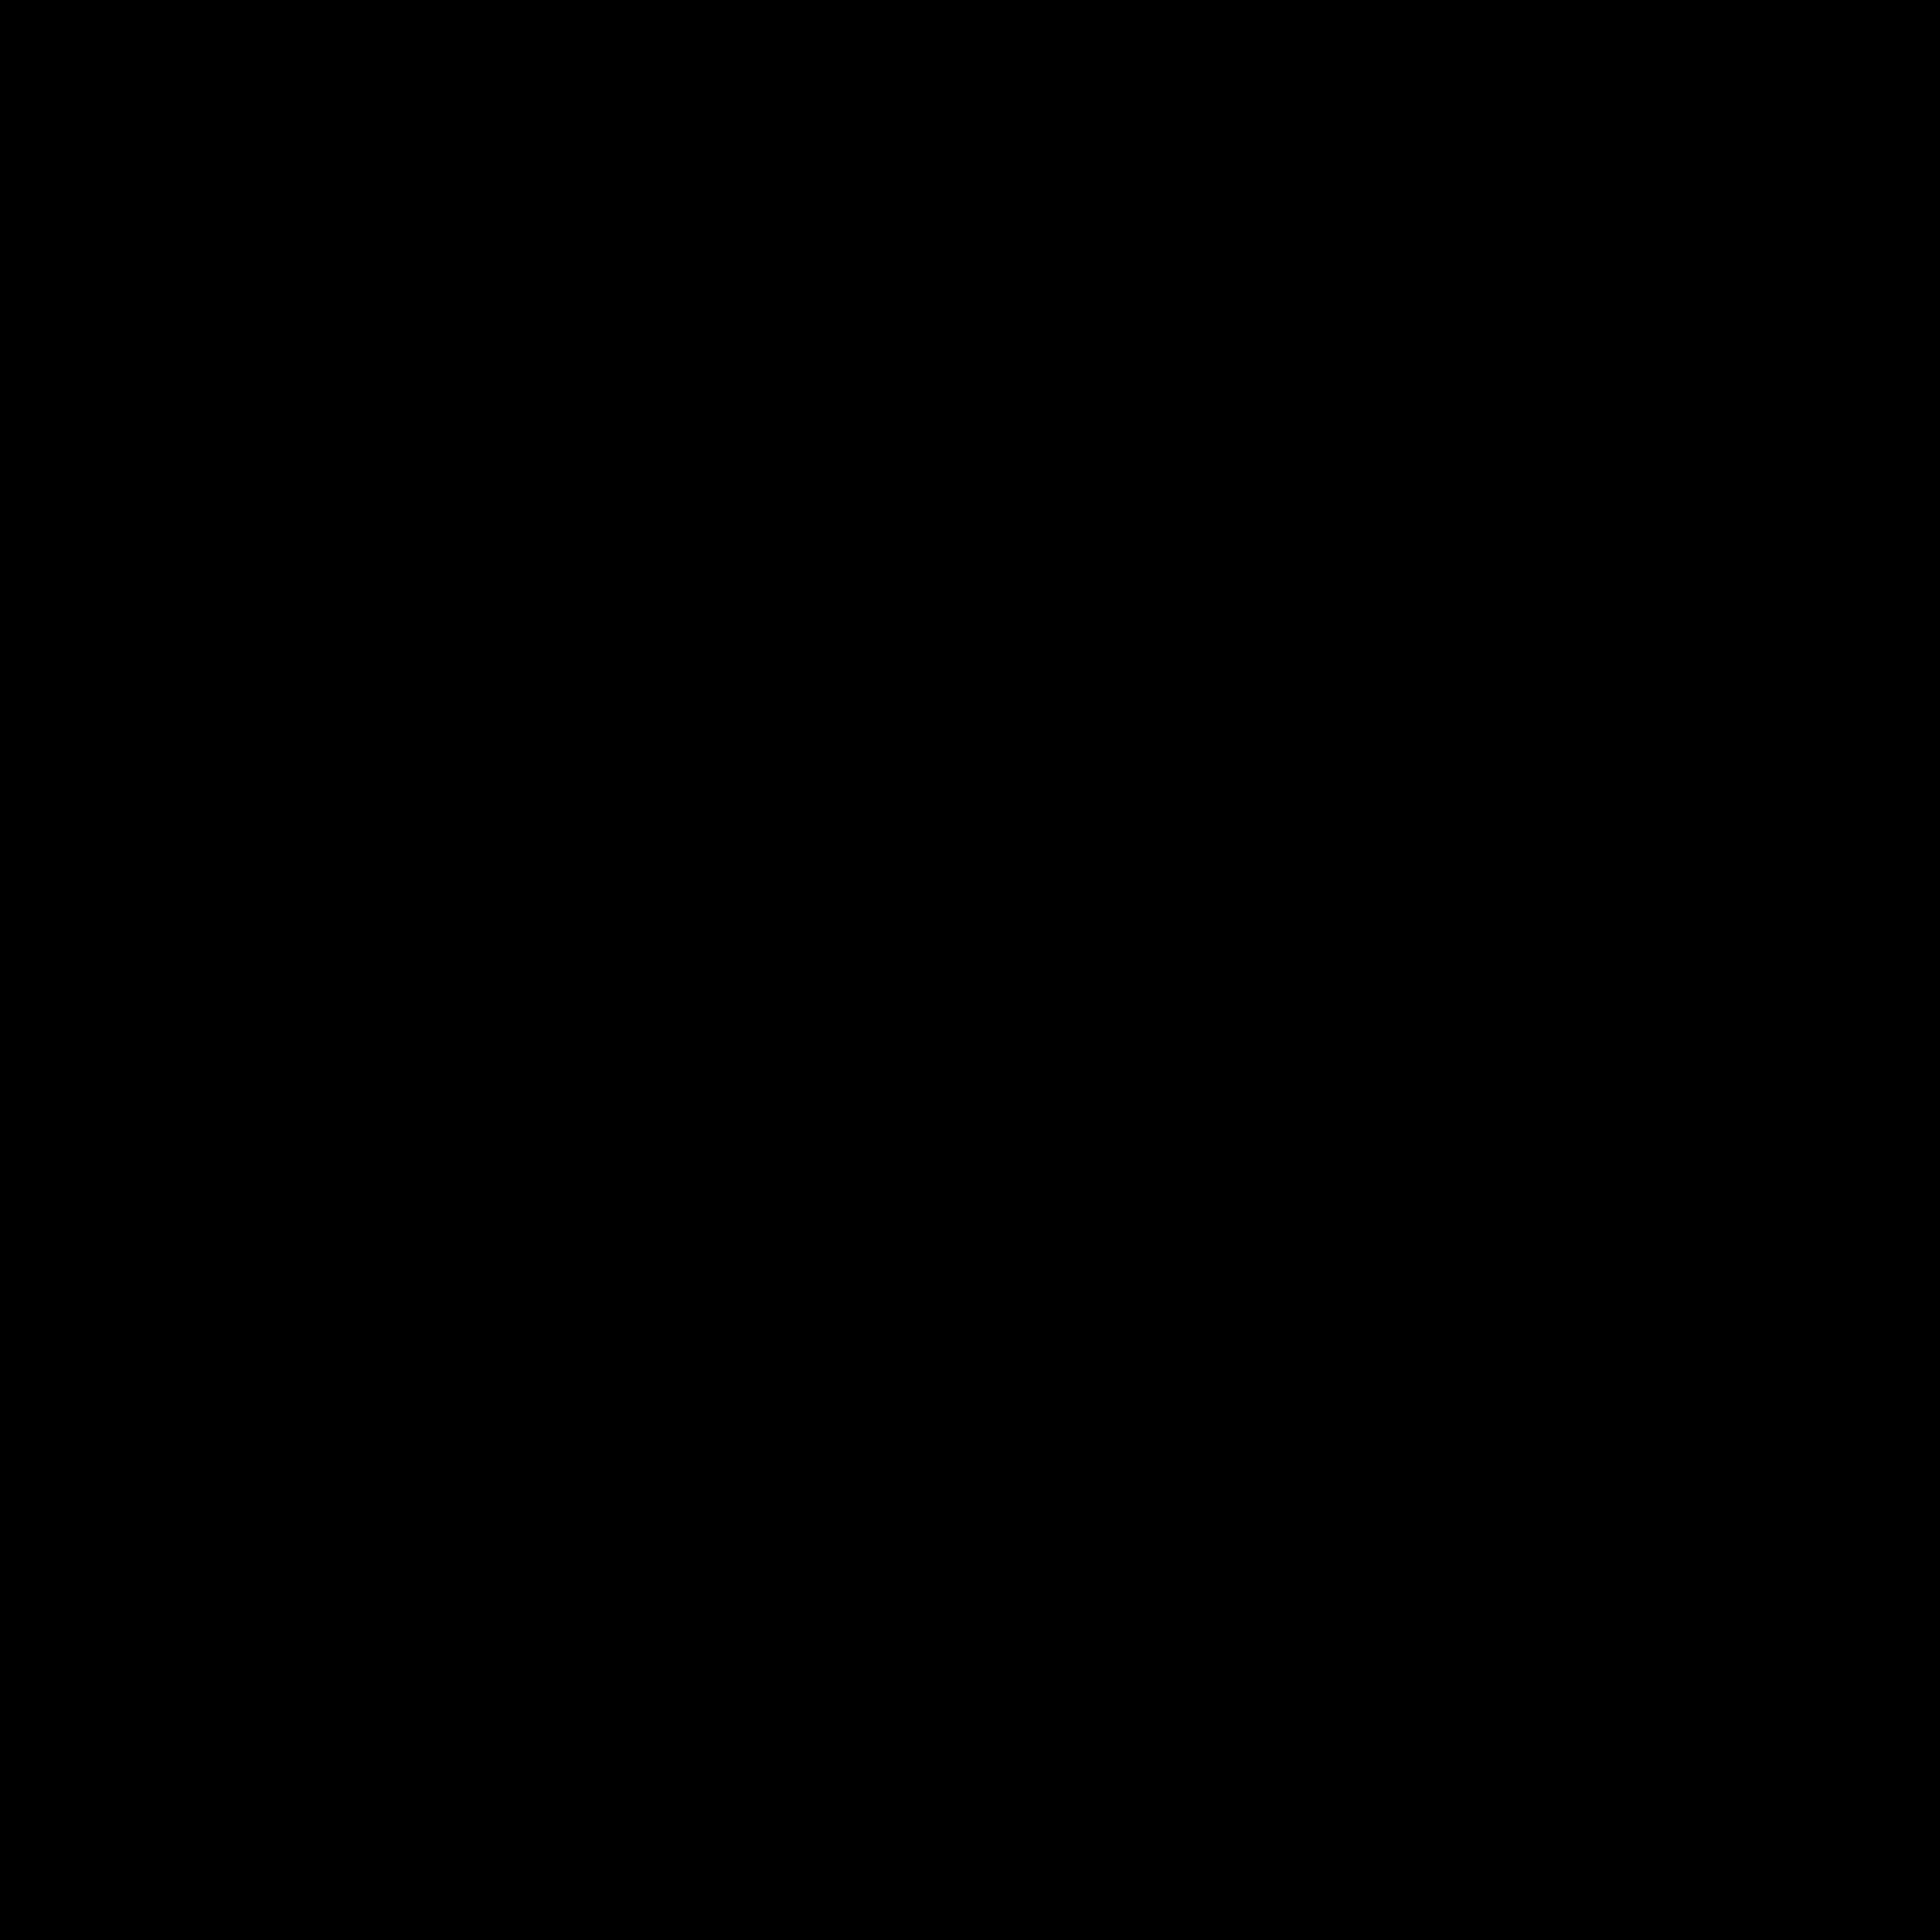 Douglas Logo PNG Transparent & SVG Vector.